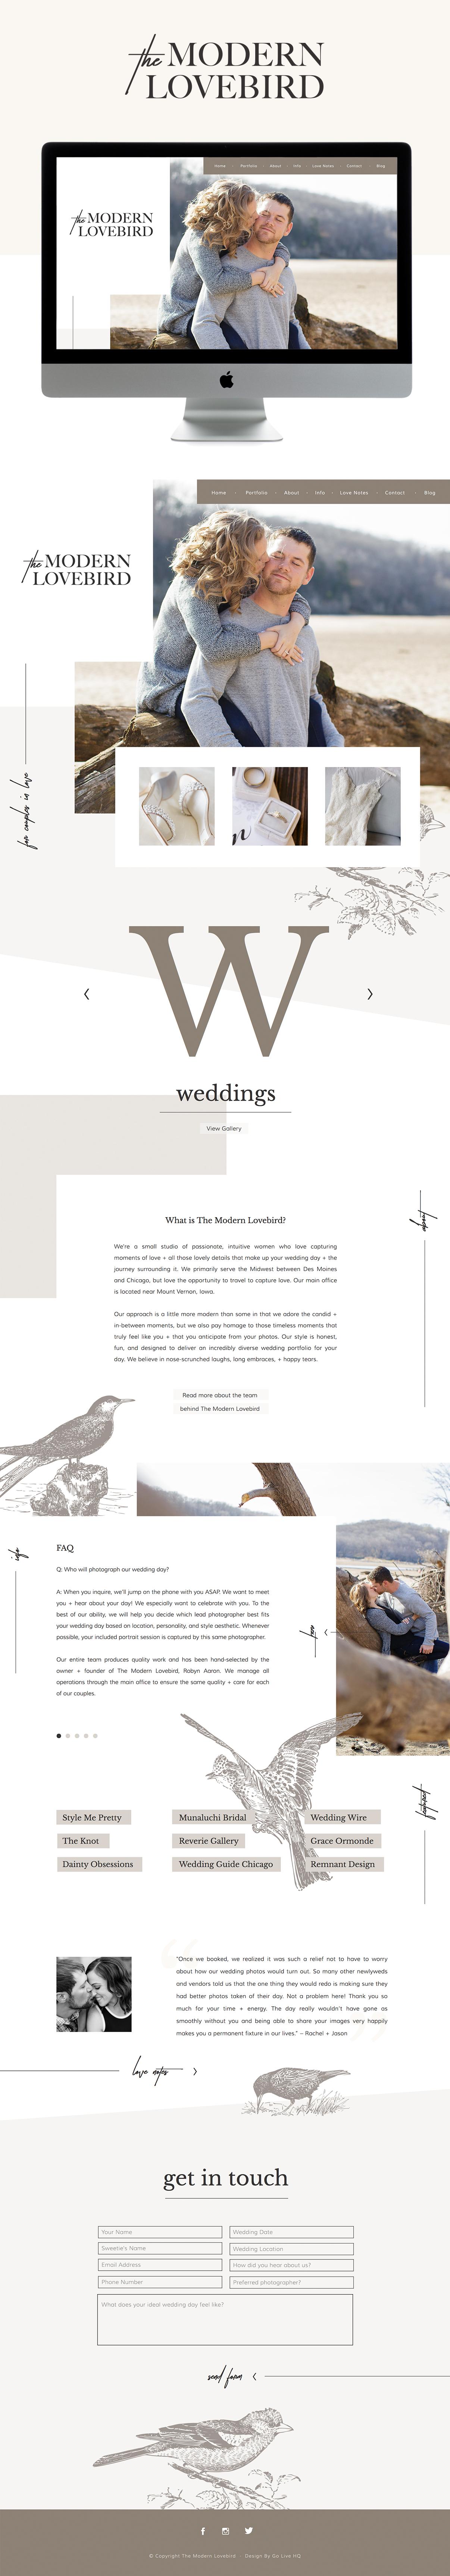 high-end, relatable, fun squarespace website design | design by: golivehq.co